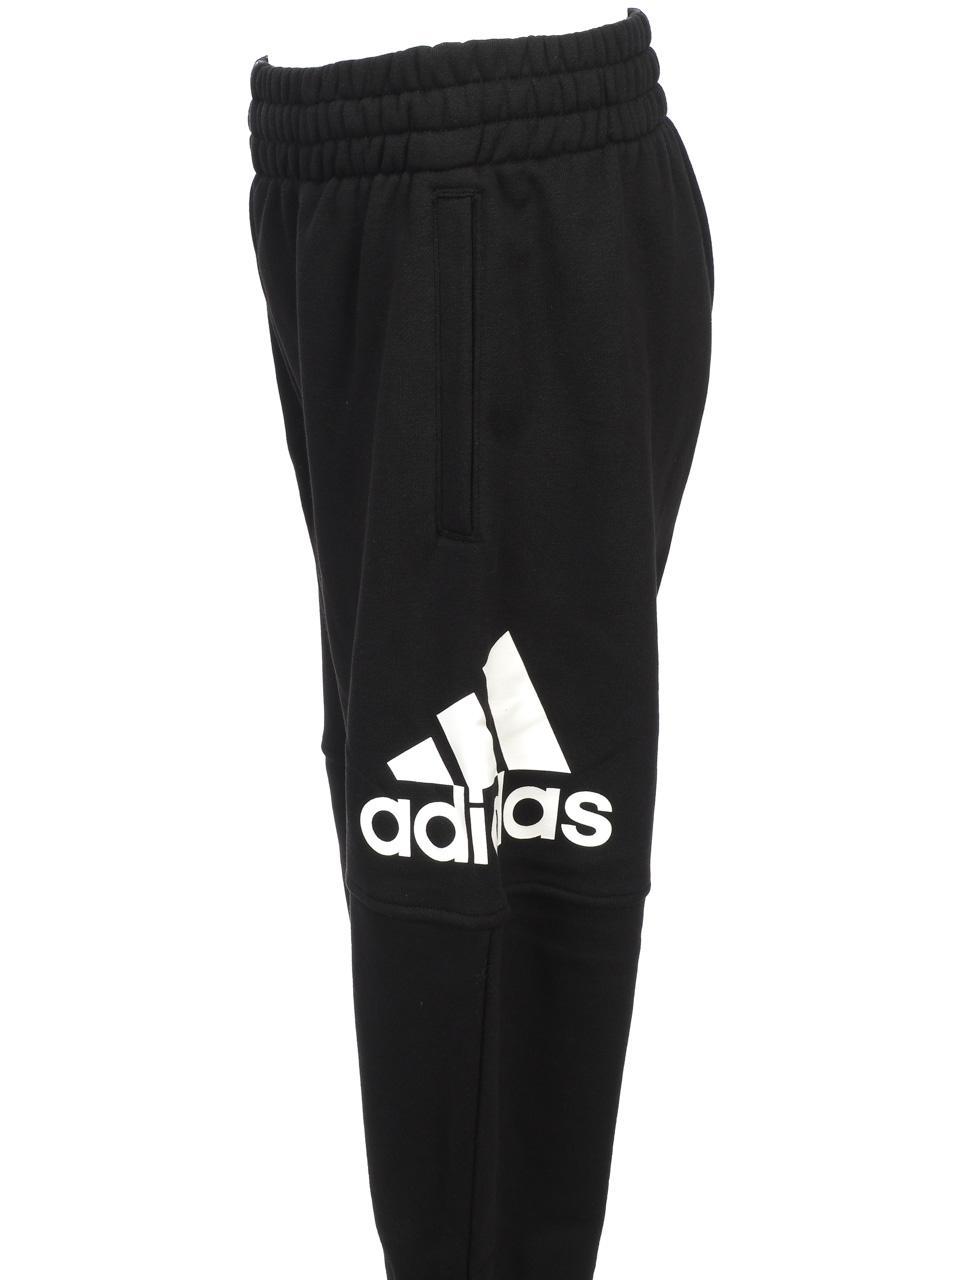 Pantalon-de-survetement-Adidas-Yb-logo-black-pantsurvet-Noir-53581-Neuf